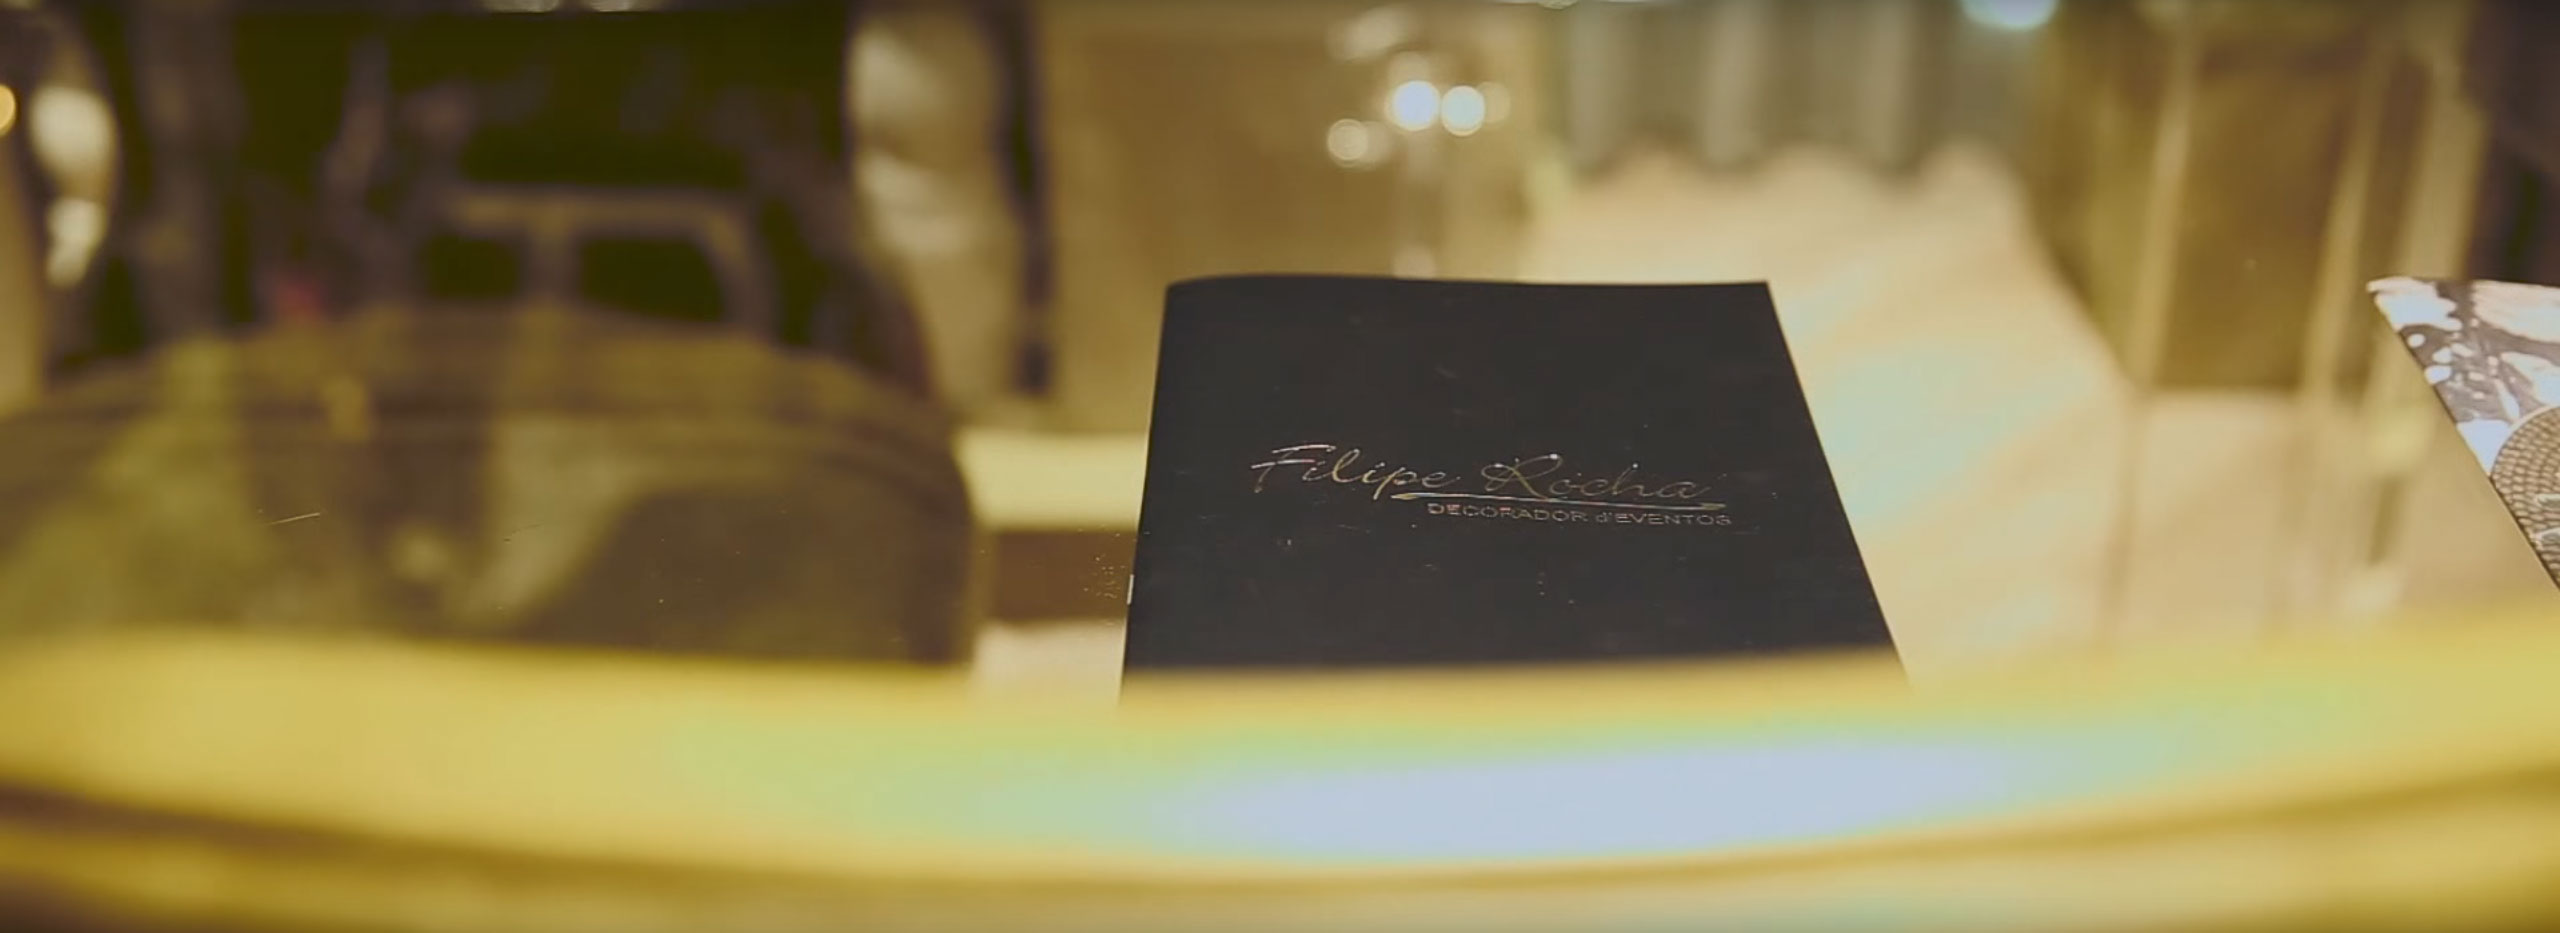 Filipe rocha wedding